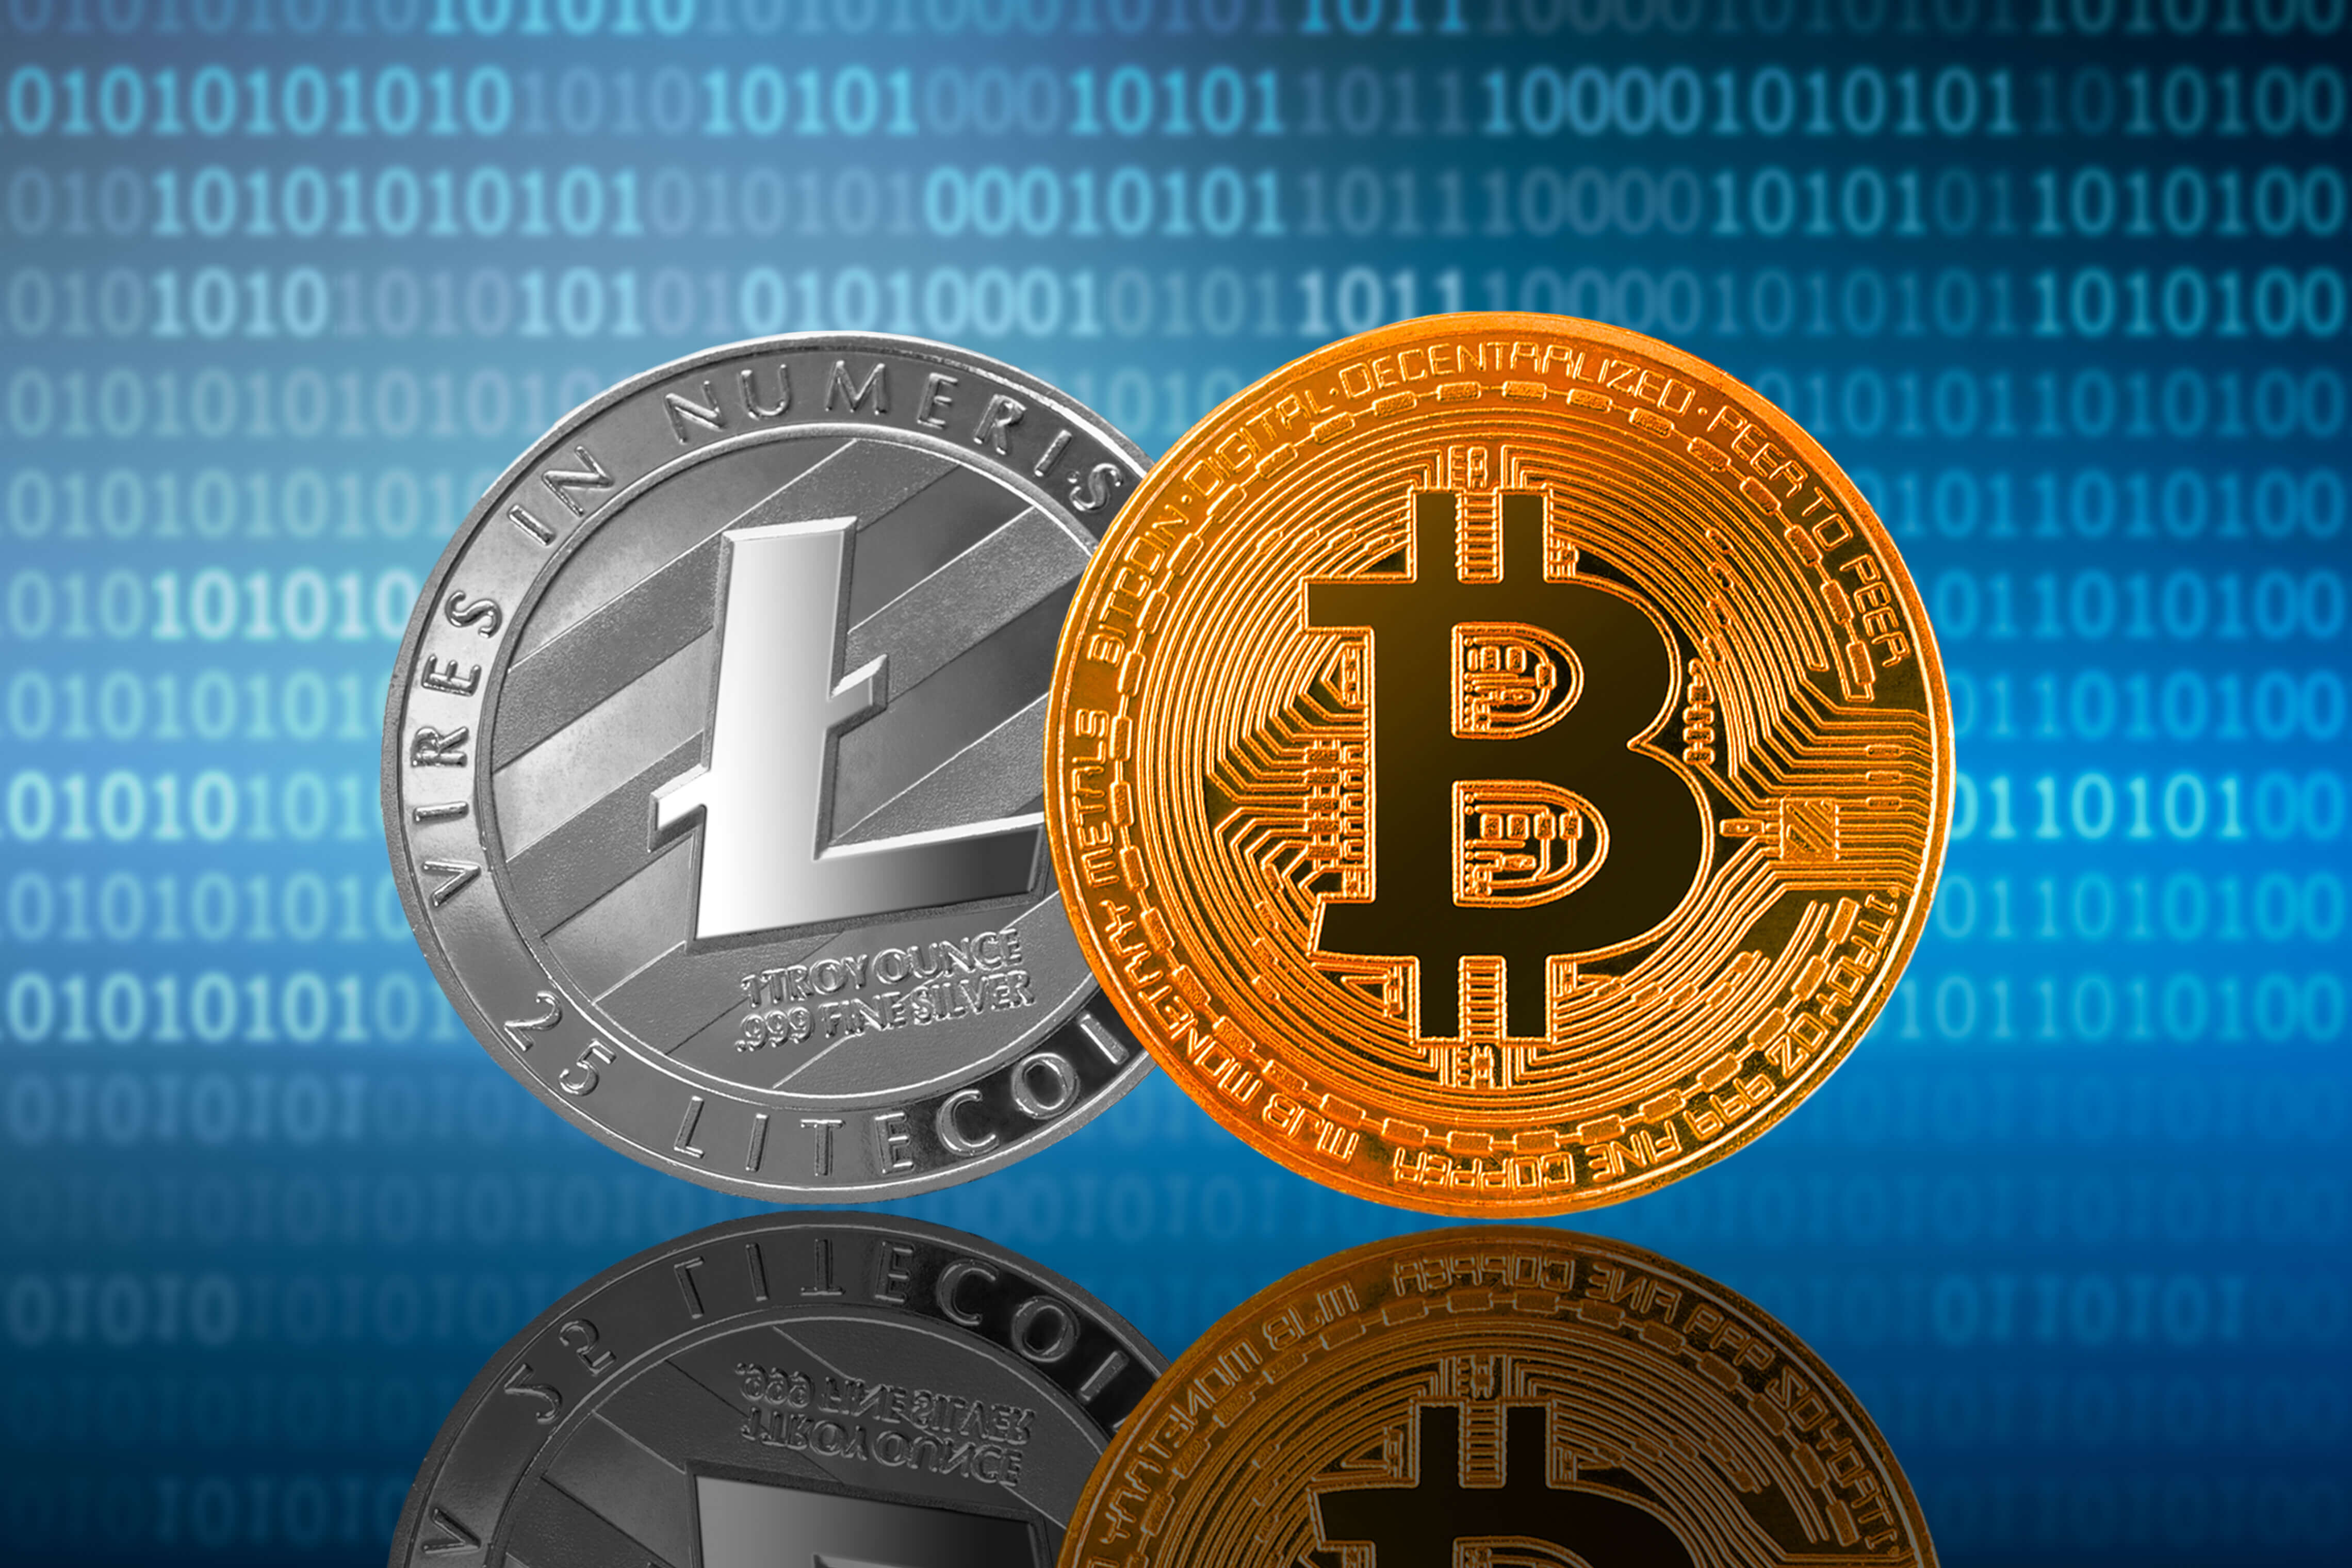 Digital currencies on September 18